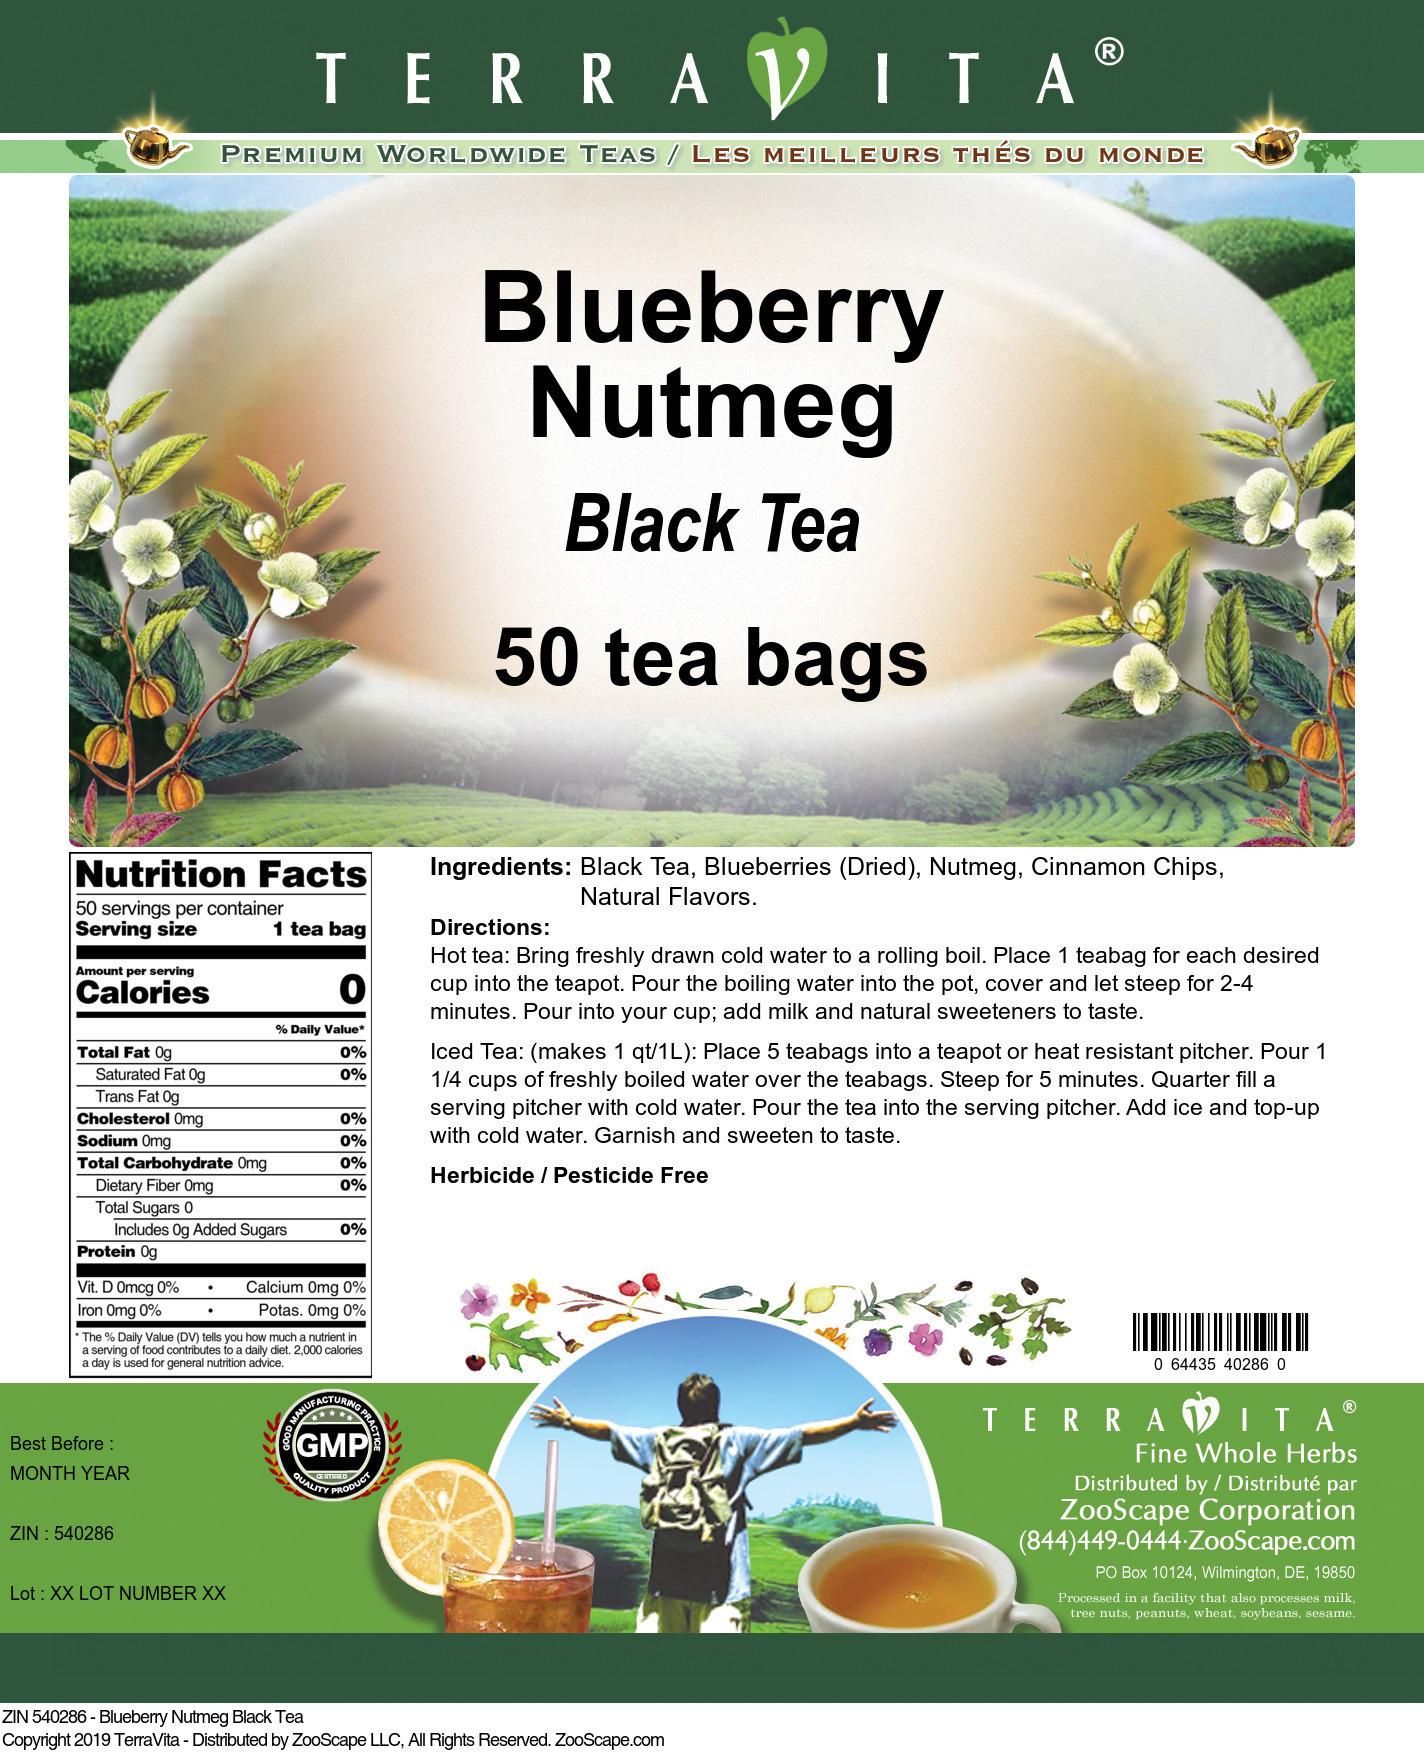 Blueberry Nutmeg Black Tea